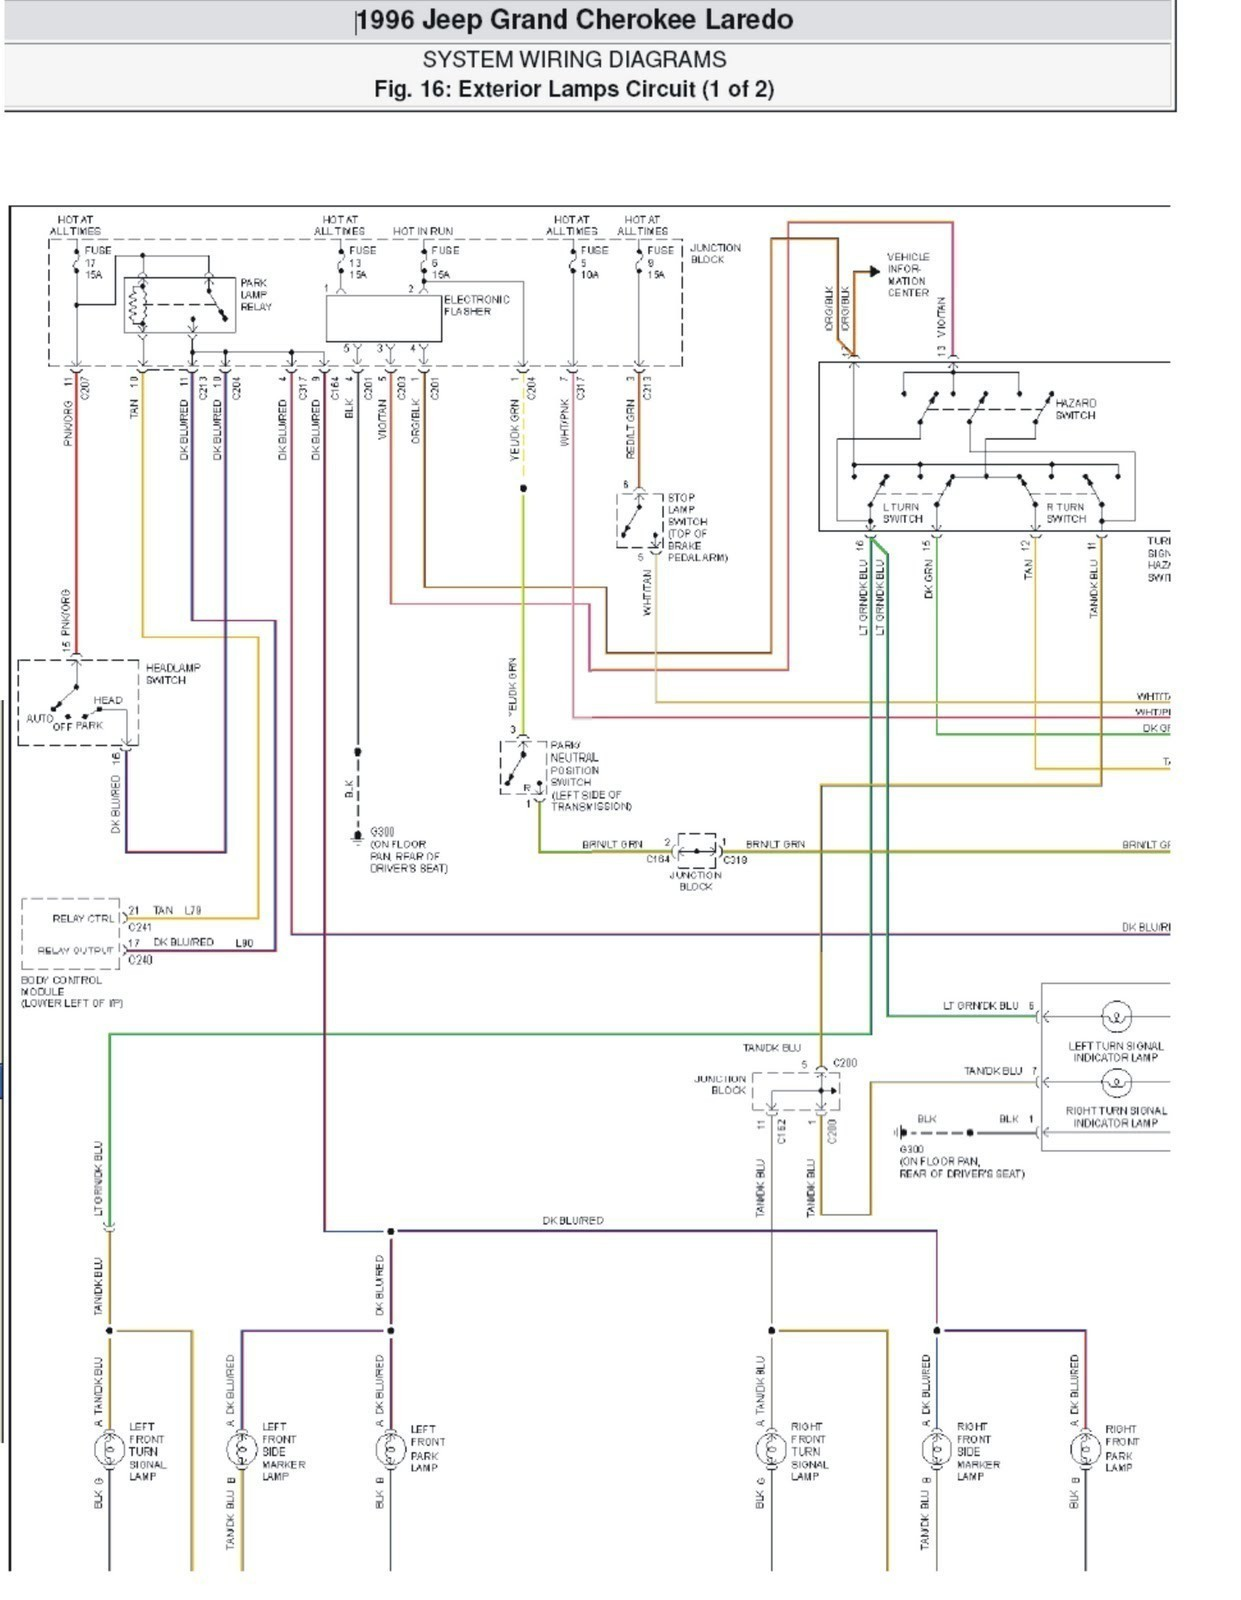 hight resolution of 2000 jeep grand cherokee trailer wiring diagram simple trailer wiring diagram 94 jeep grand cherokee valid